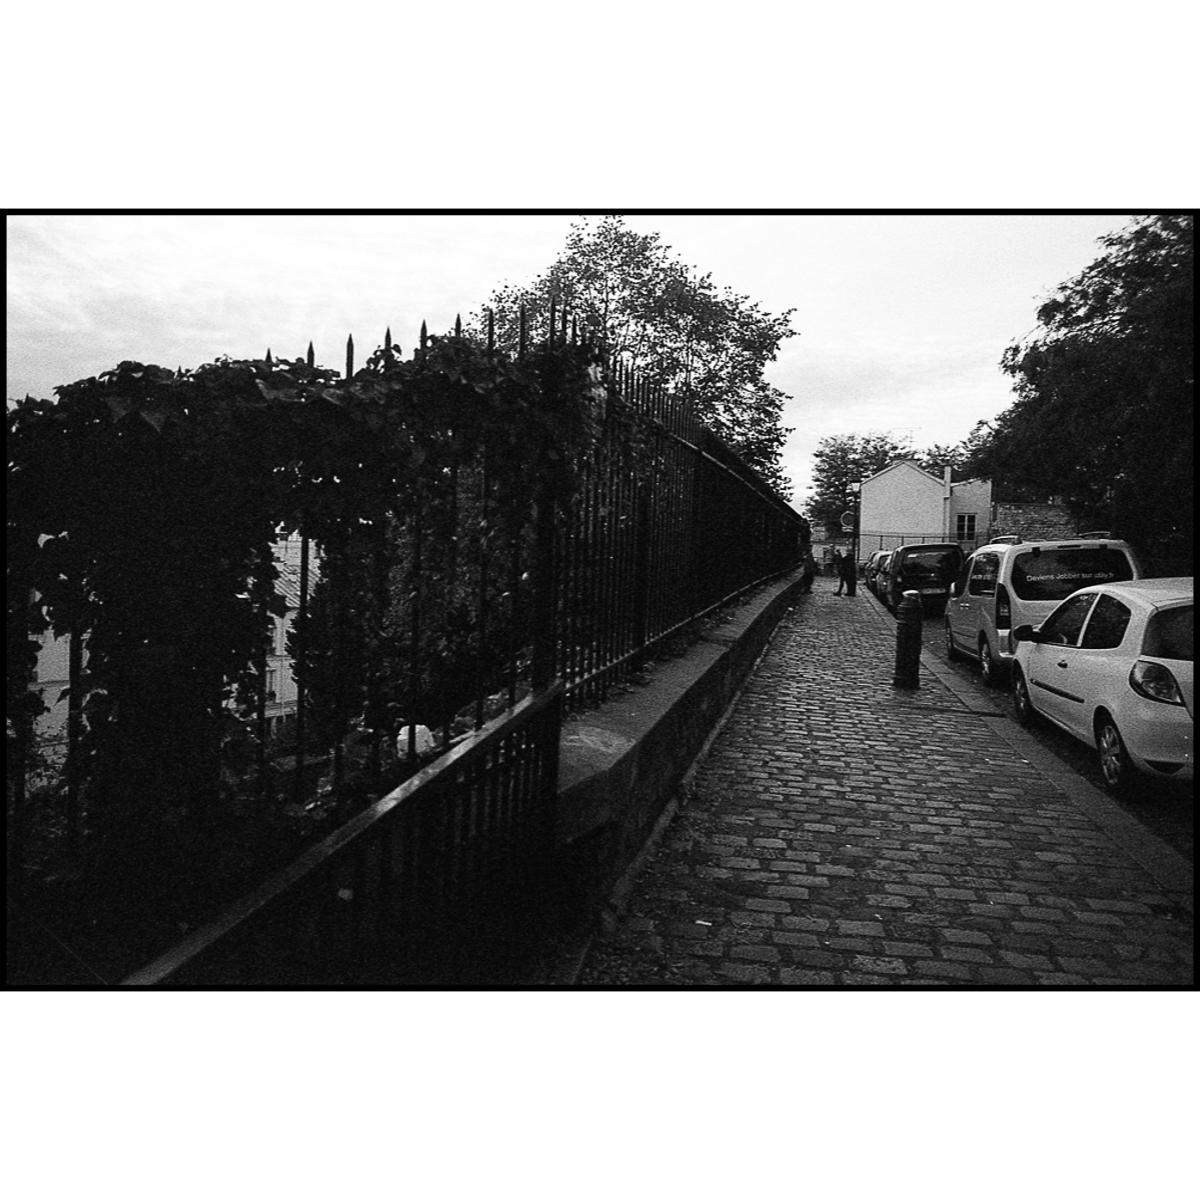 paris file-049.jpg